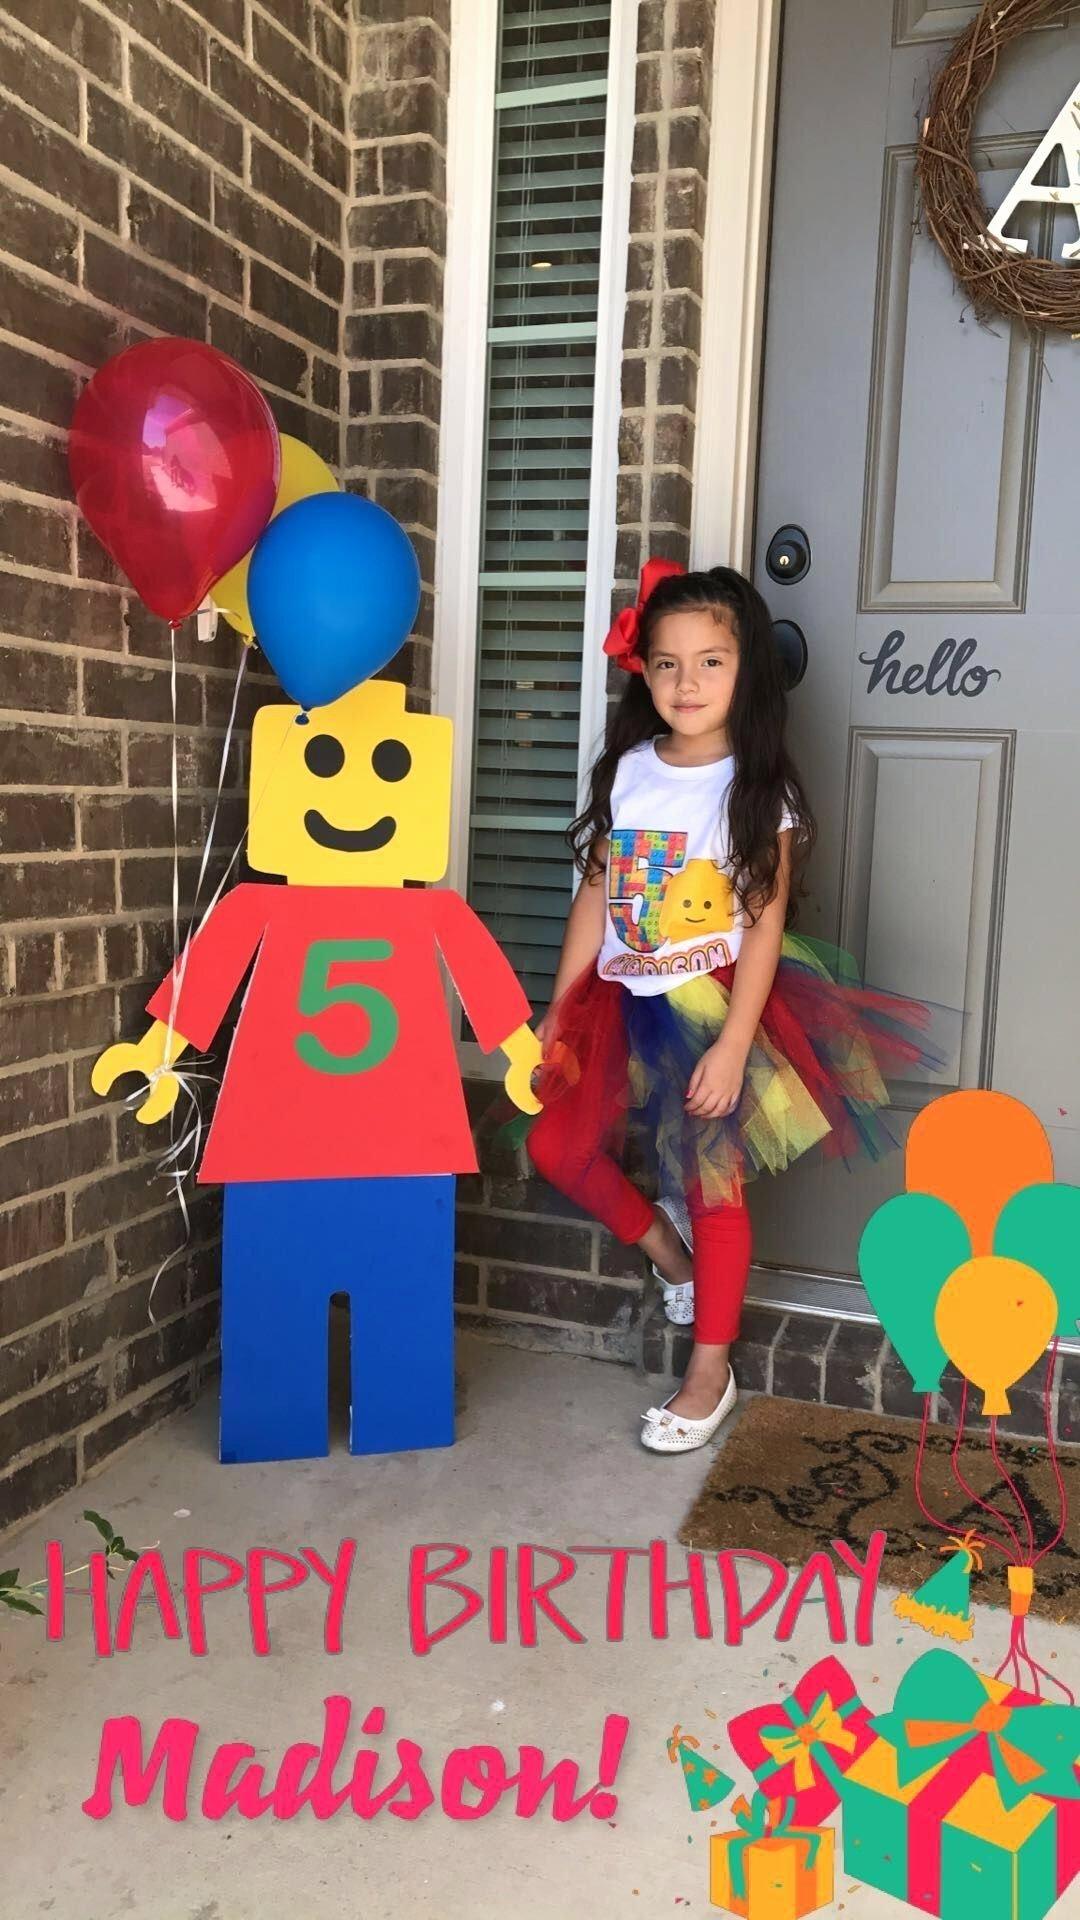 Lego Birthday Decoration Ideas Unique Lego Birthday Decoration Ideas In 2020